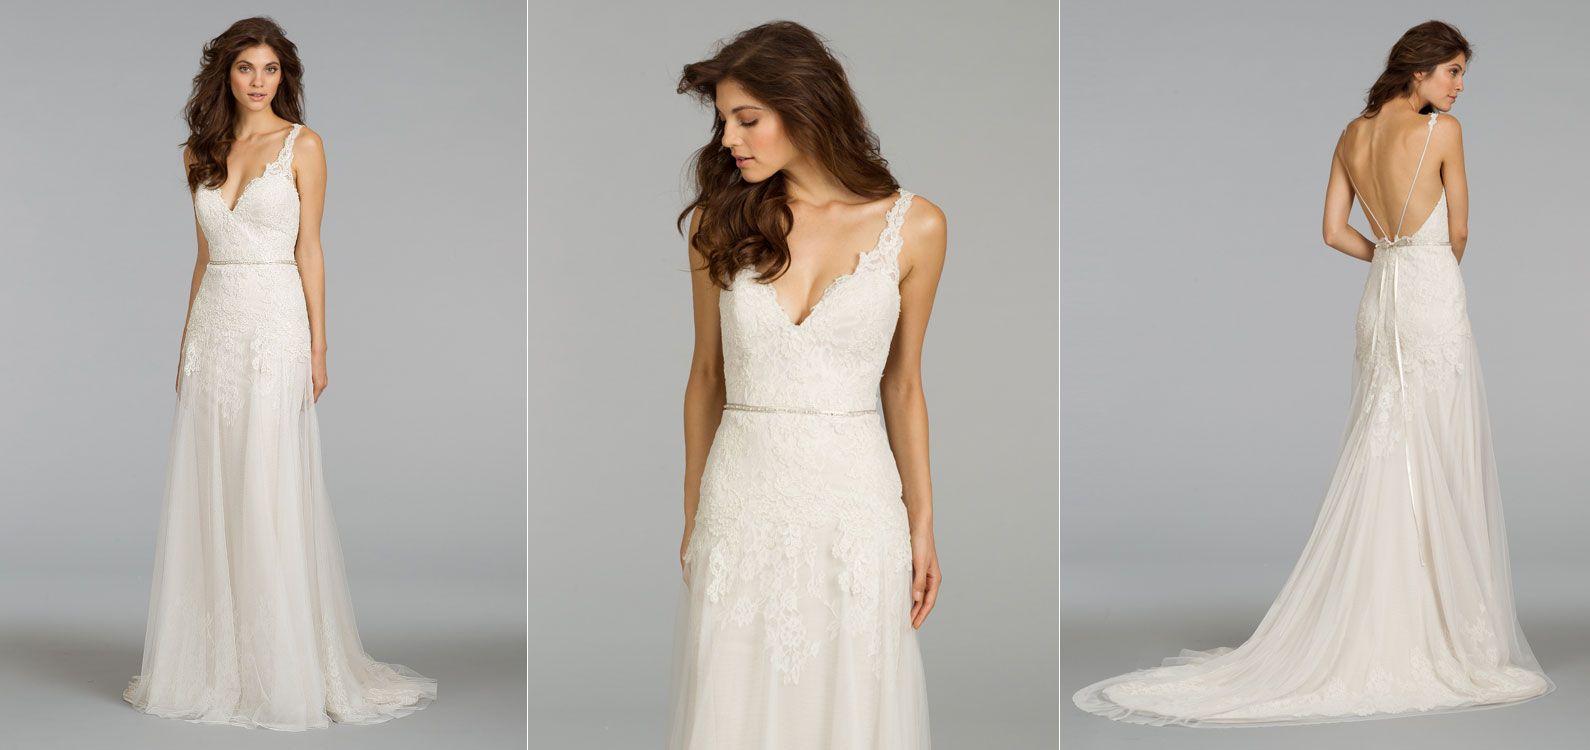 Bridal Gowns, Wedding Dresses by Alvina Valenta - Style AV9405 ...